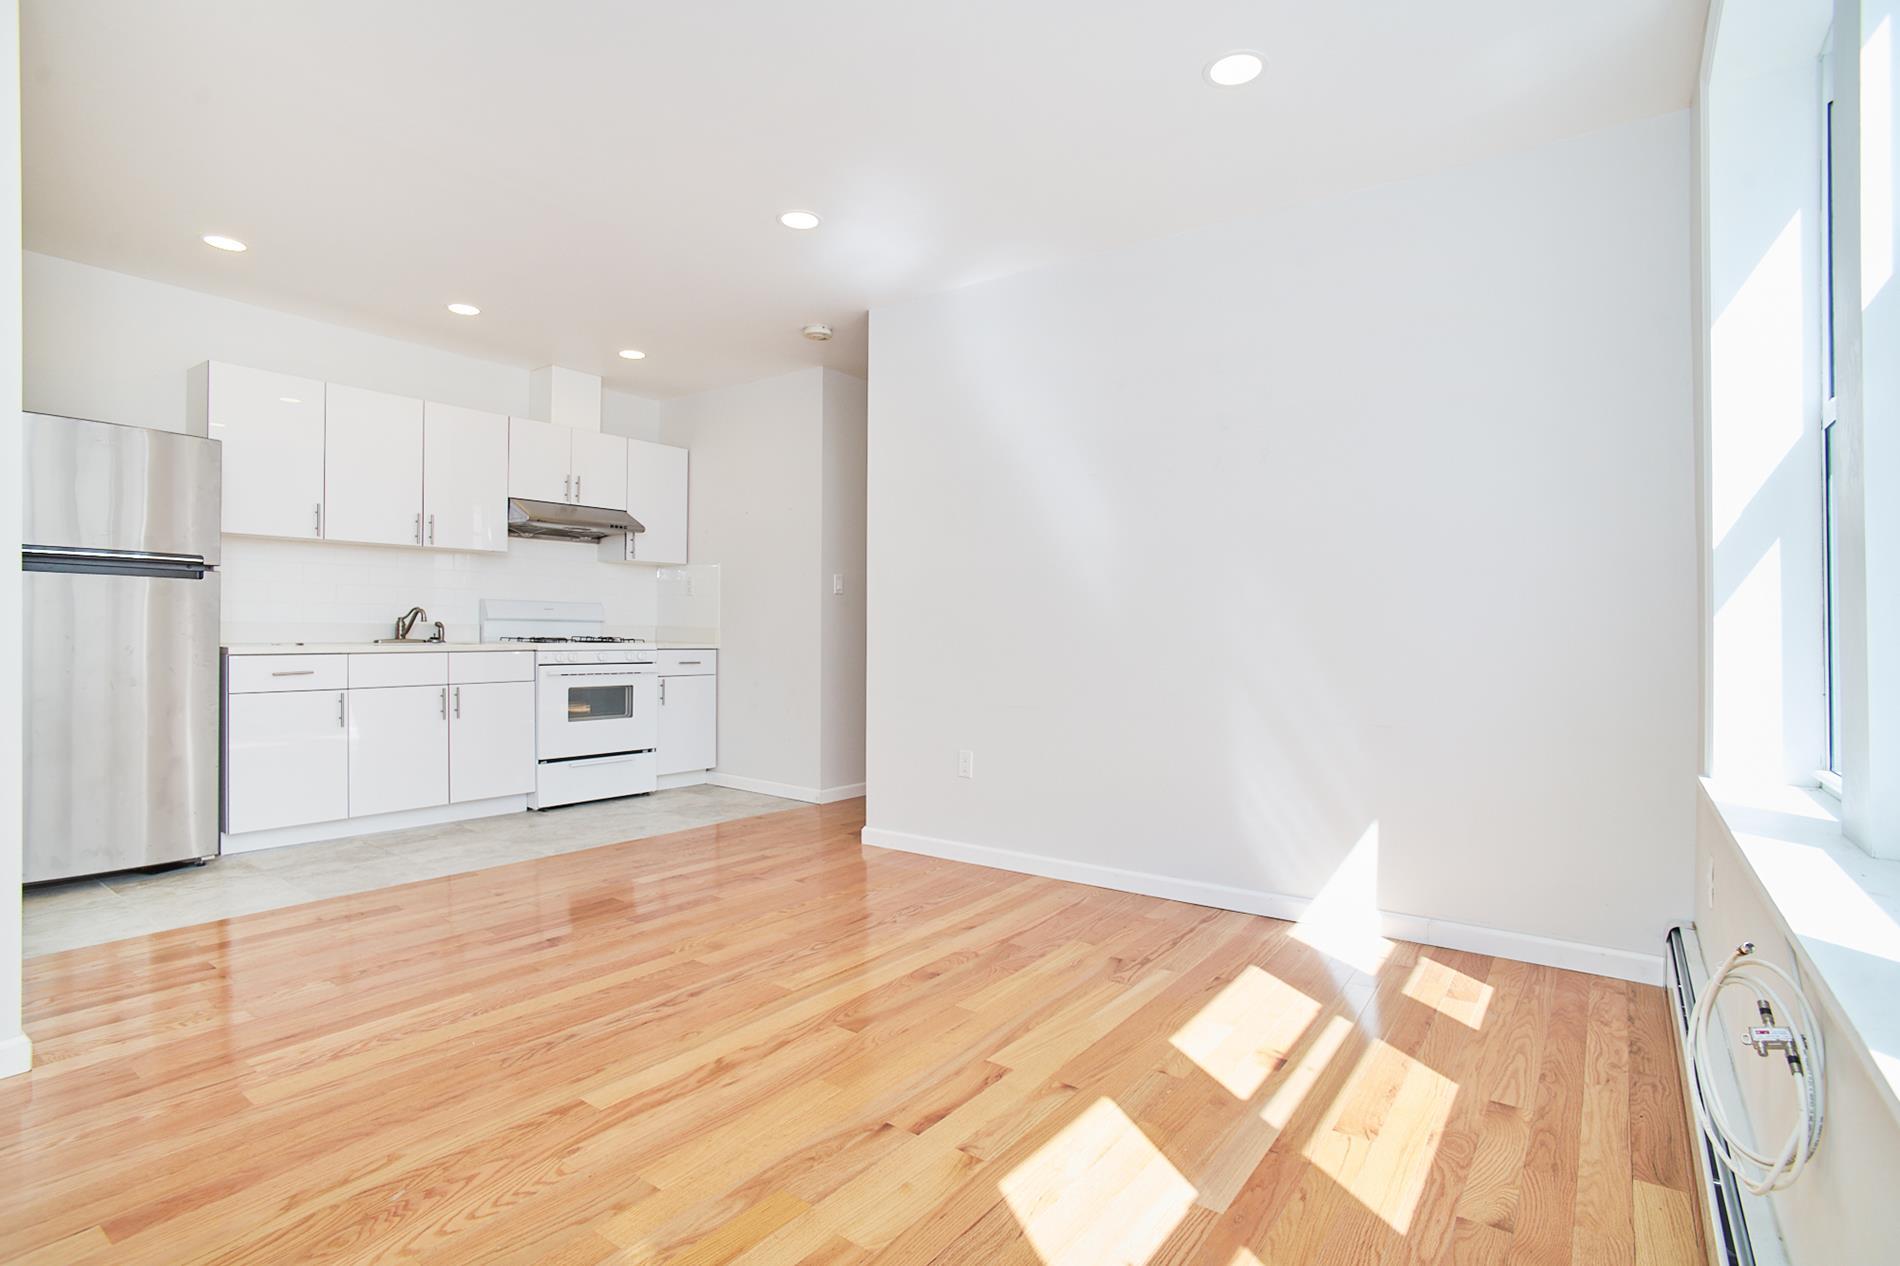 163 Sullivan Place, Apt 2, Brooklyn, New York 11225